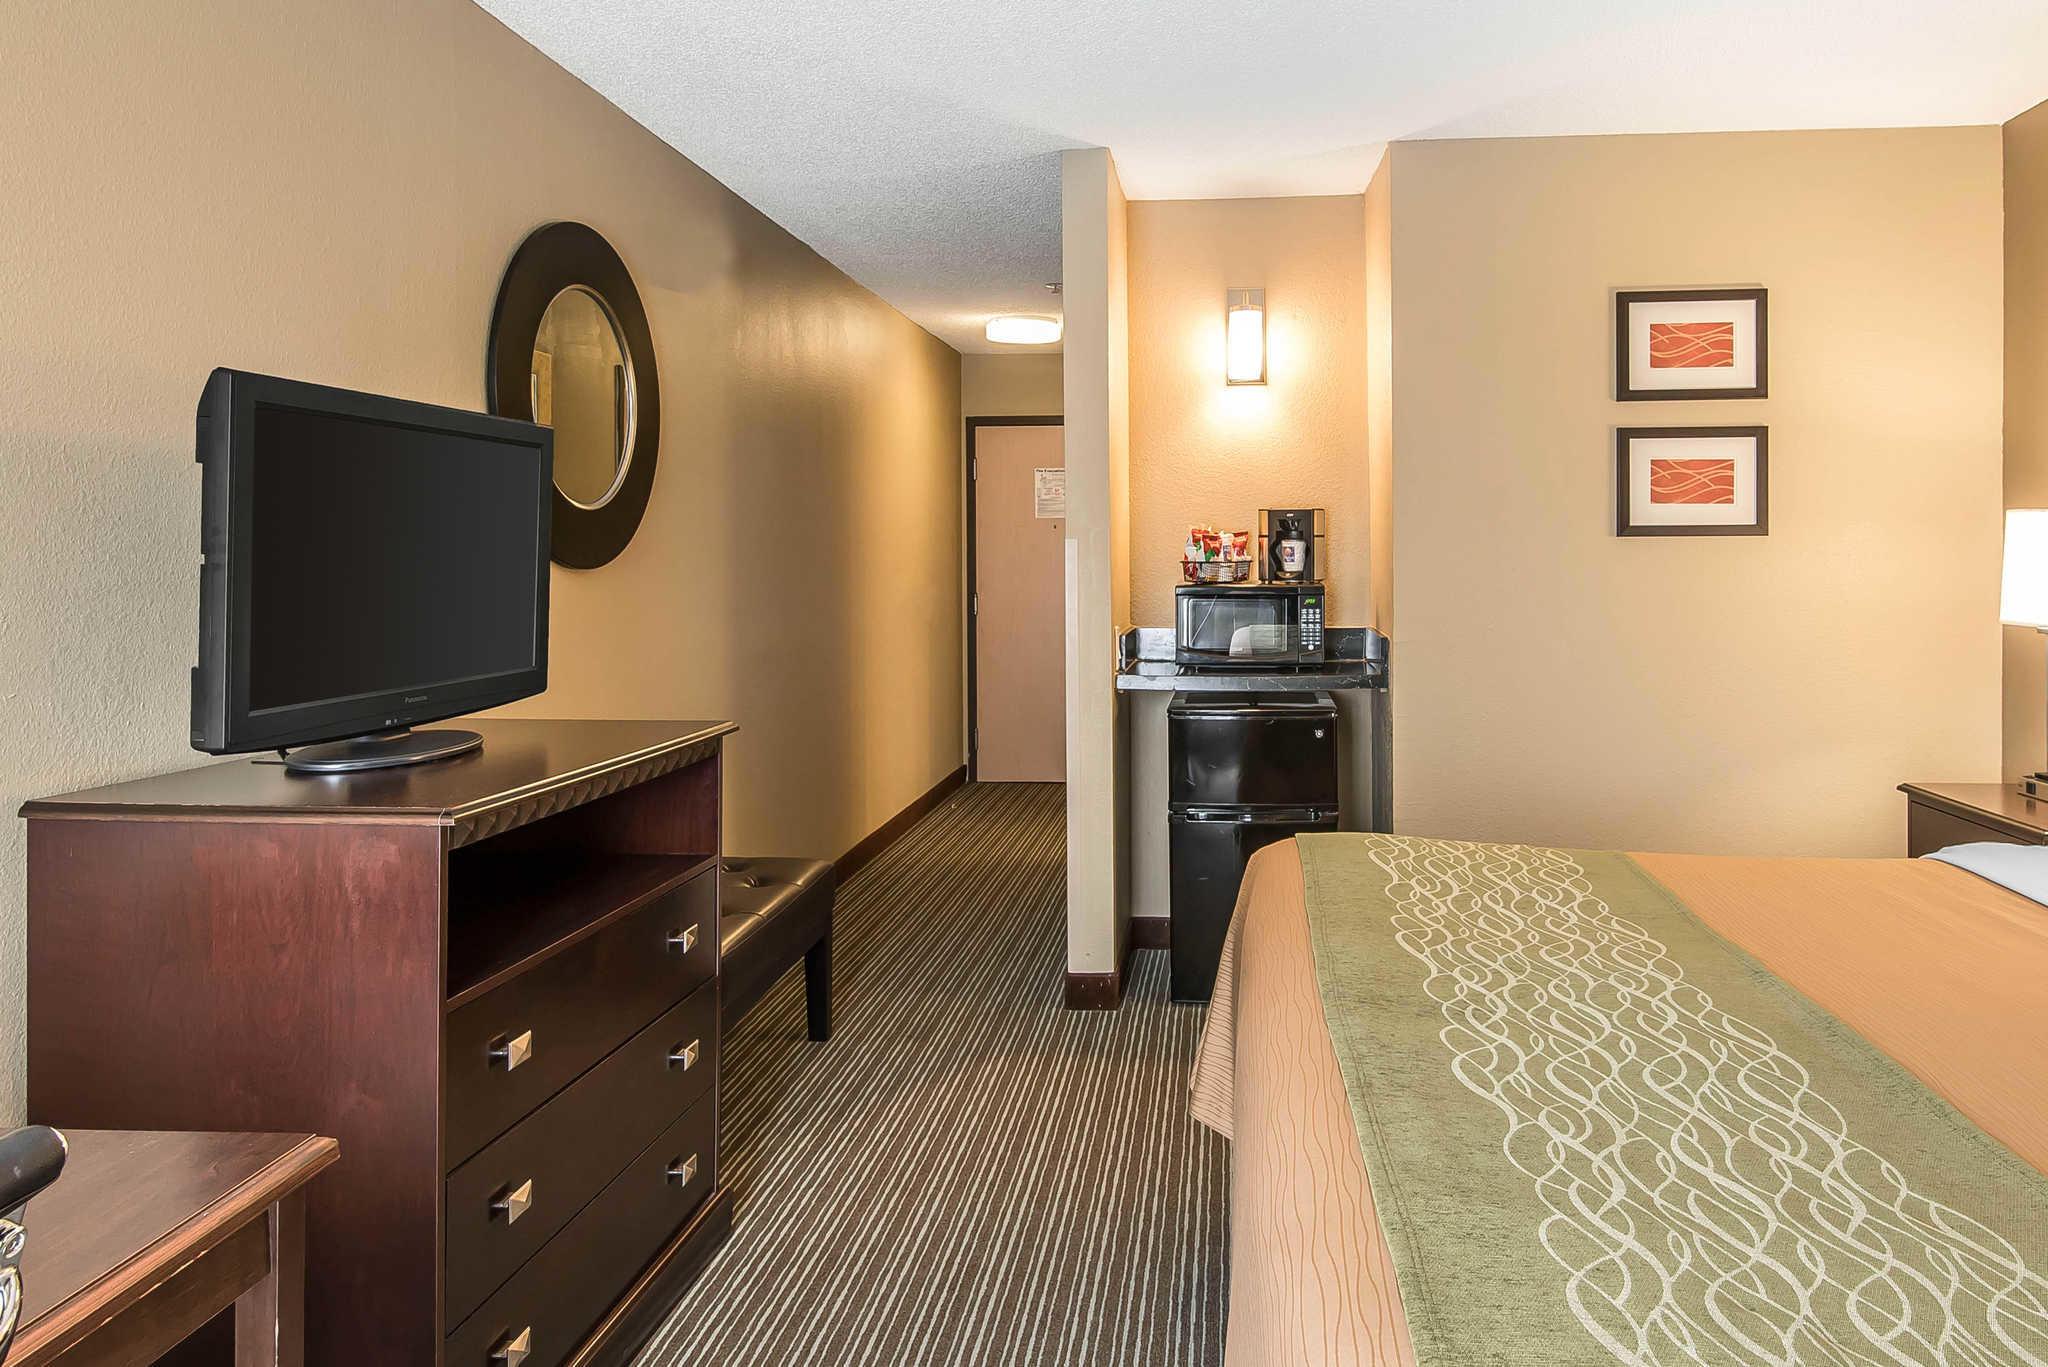 Comfort Inn & Suites Kansas City - Northeast image 8